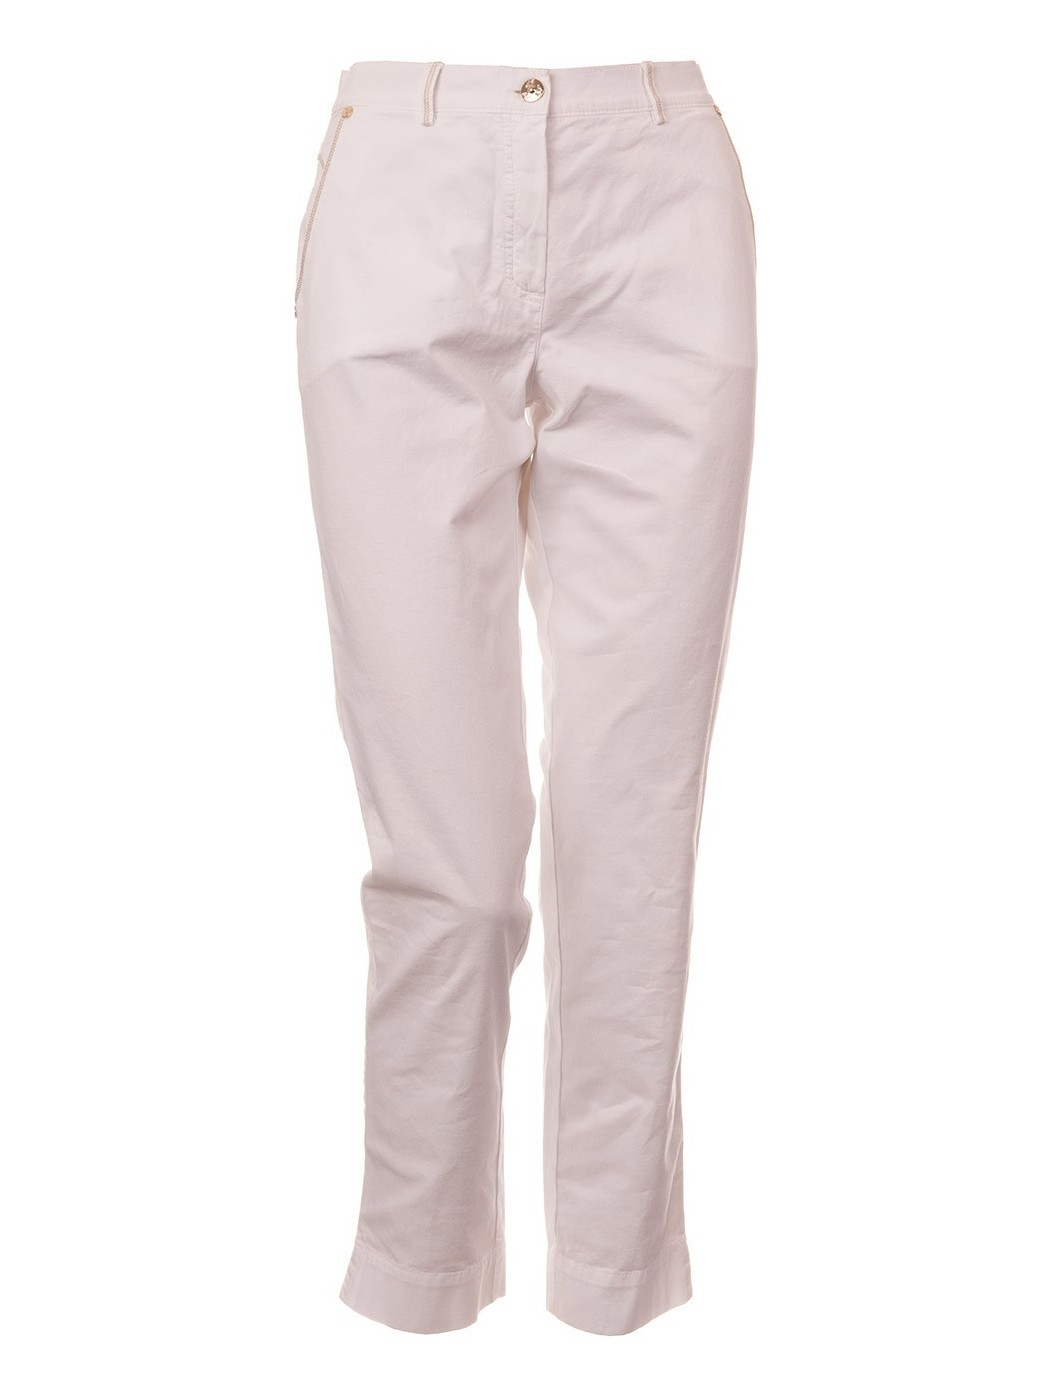 Pantalone capri bianco Pucci